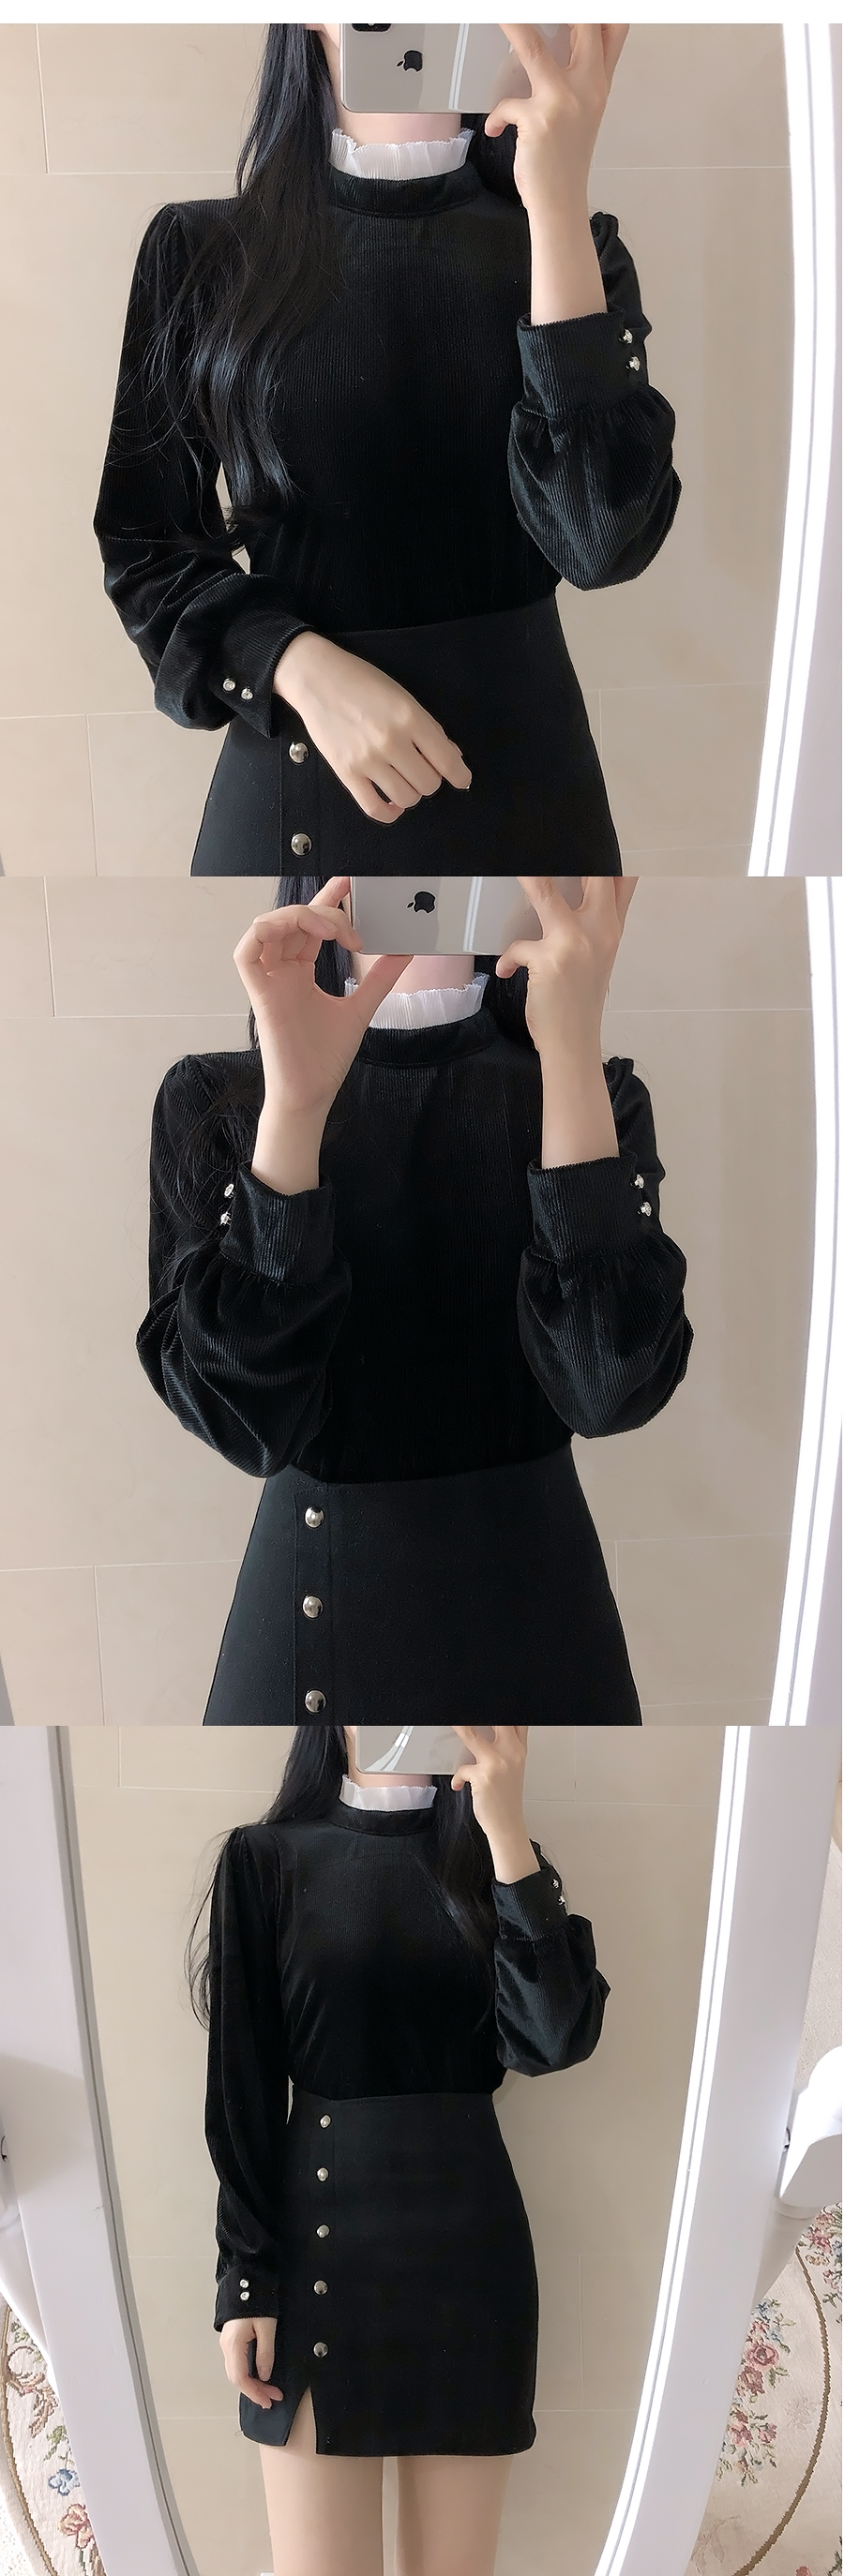 Inu color ruffle velvet blouse